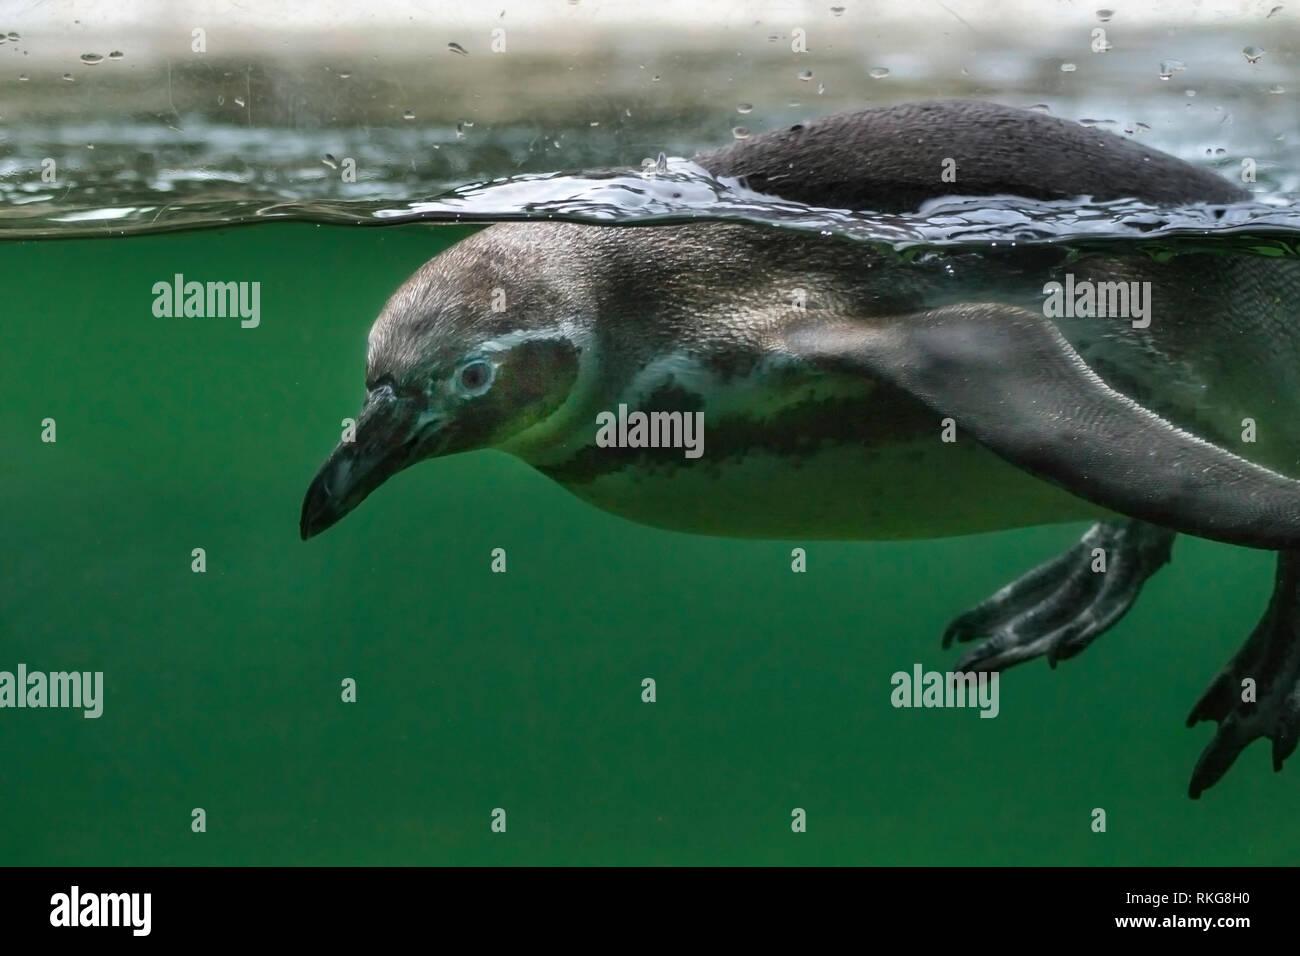 At Marwell Zoo, Southampton, UK - Stock Image